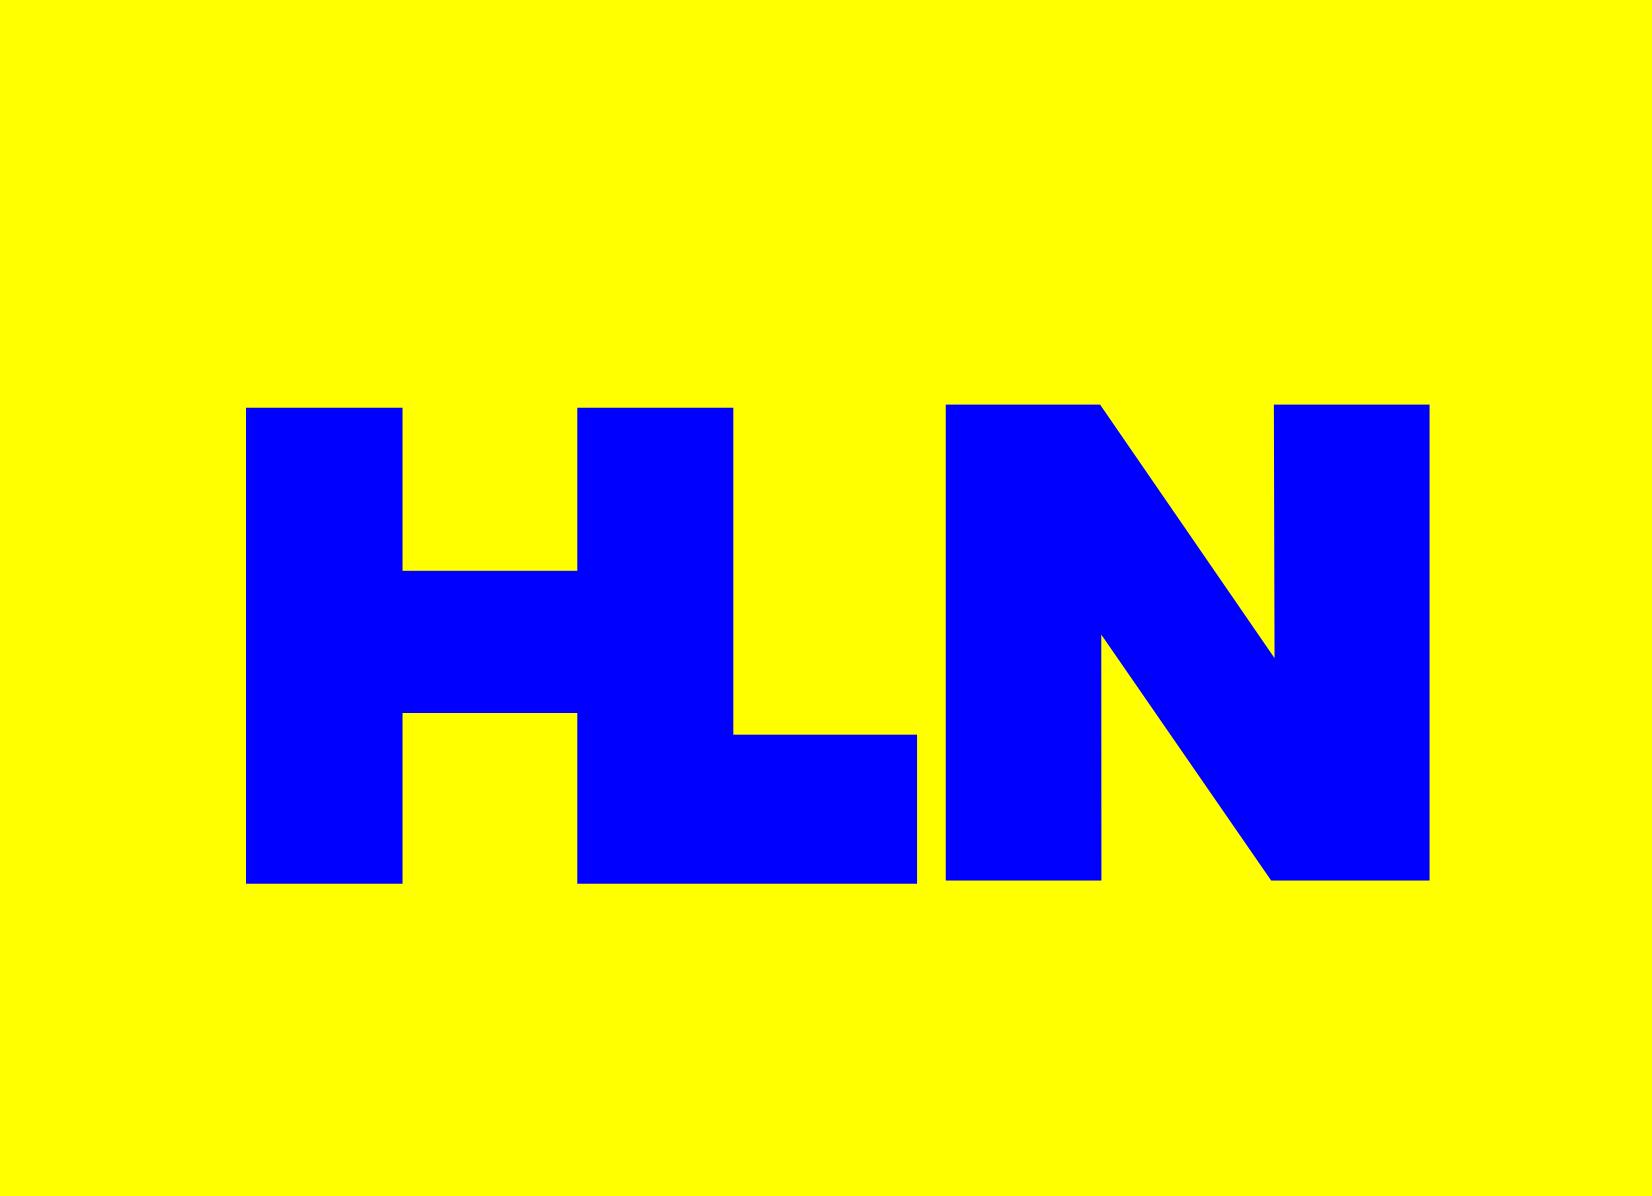 Usa News Live >> Watch Hln News Live Stream Hln News Usa Online Streaming